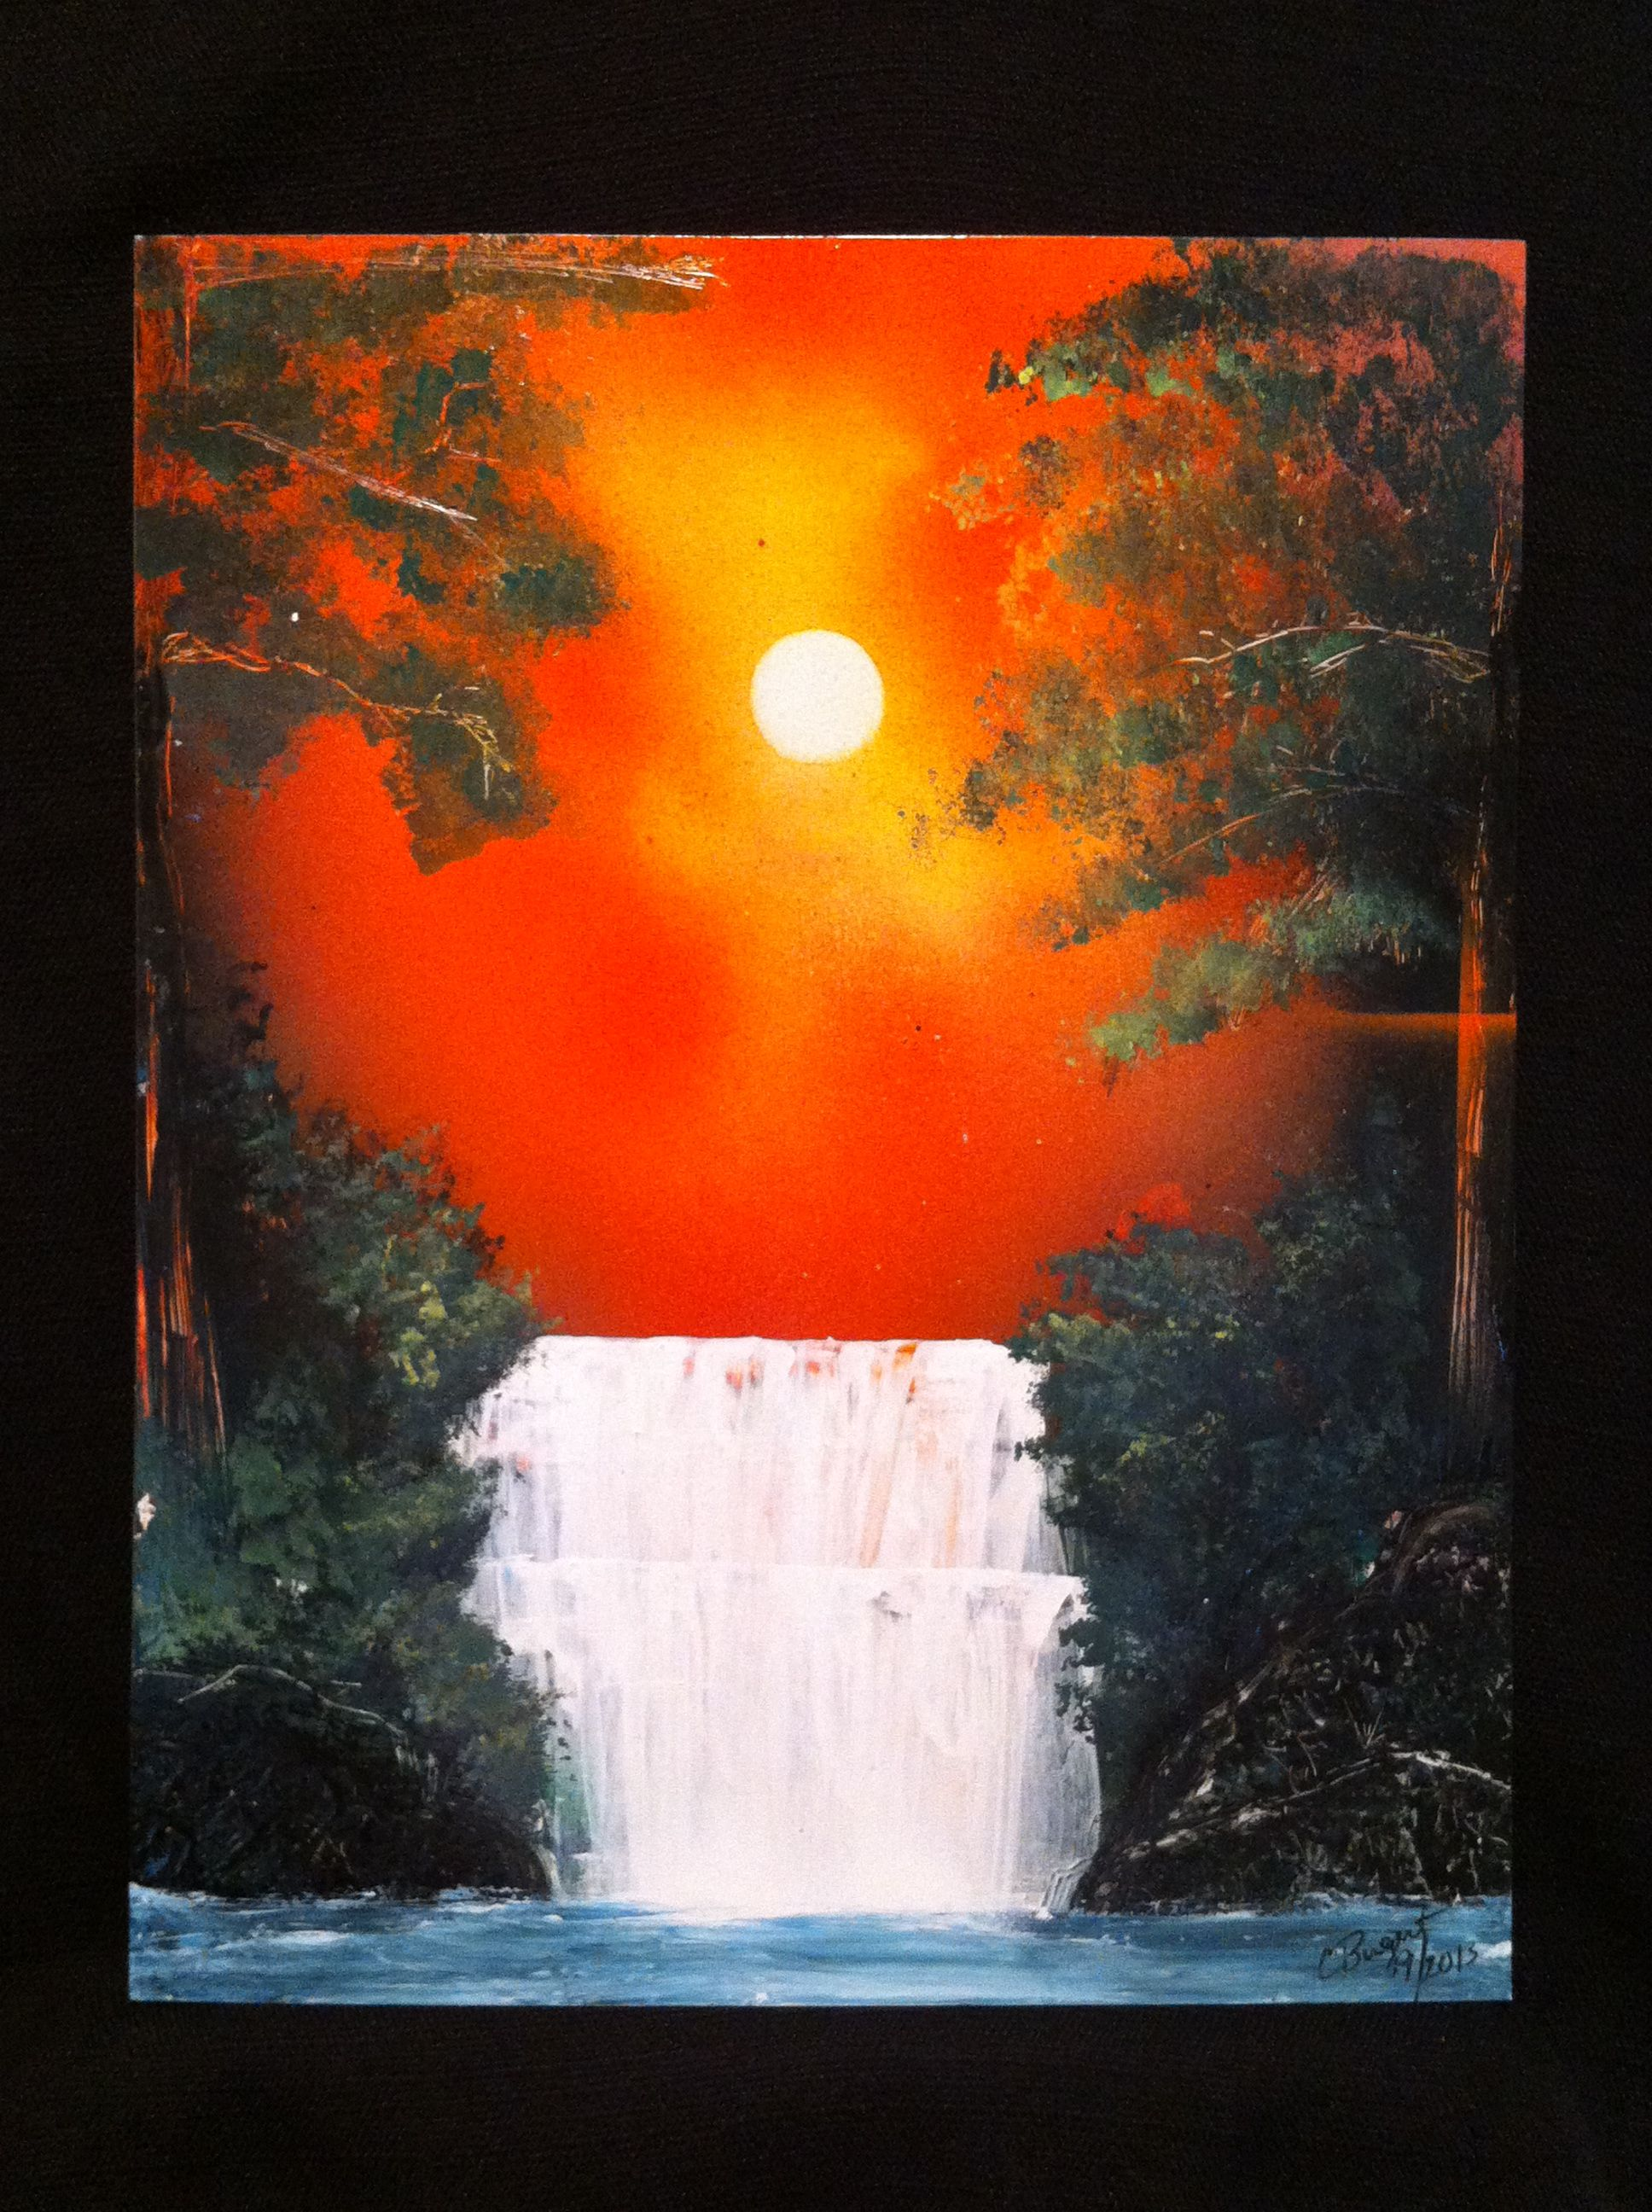 spray paint art sunset waterfall art inspiration. Black Bedroom Furniture Sets. Home Design Ideas